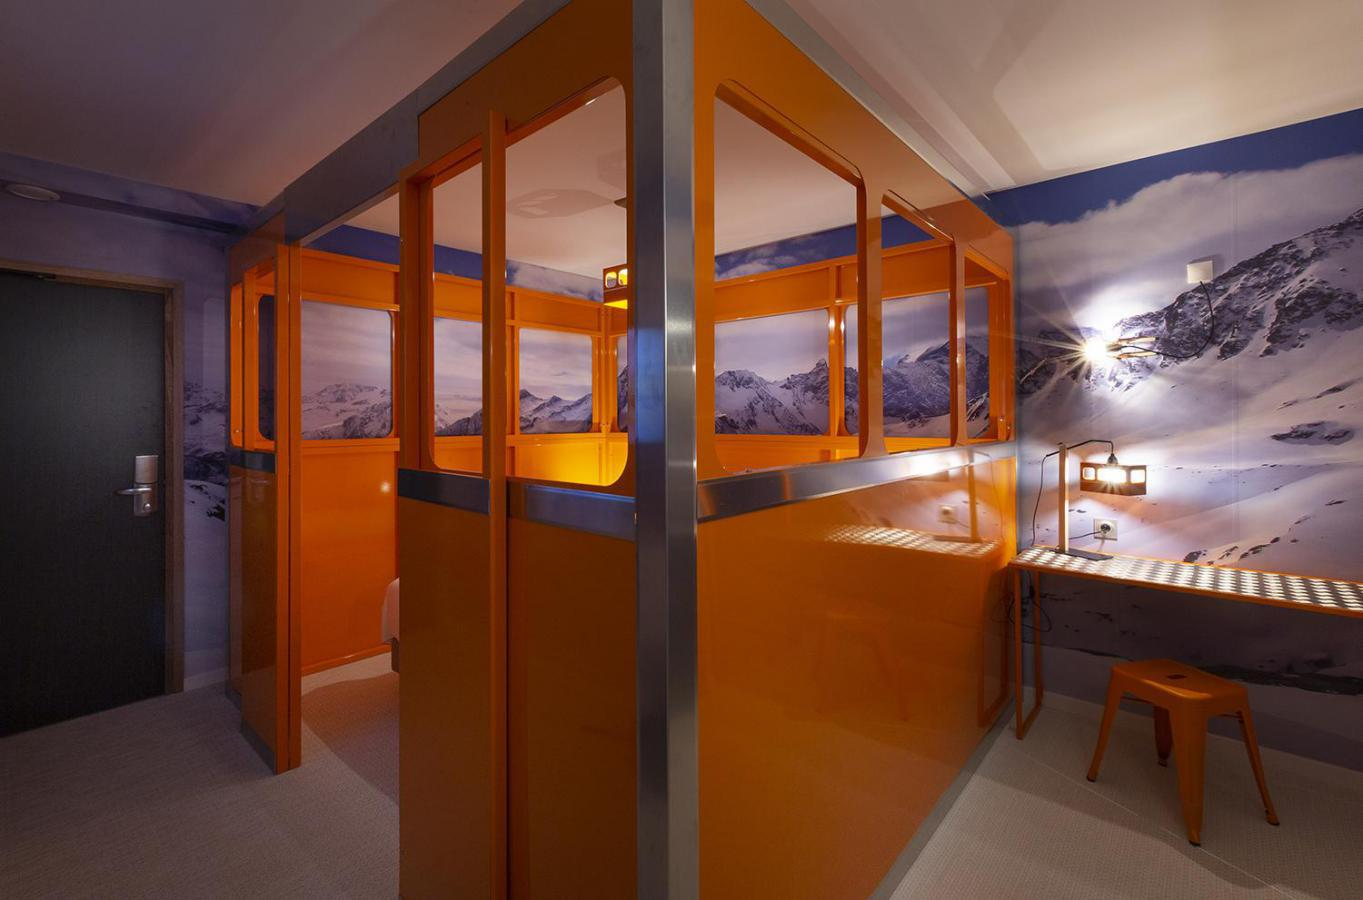 Hôtel Base Camp Lodge à Bourg St Maurice